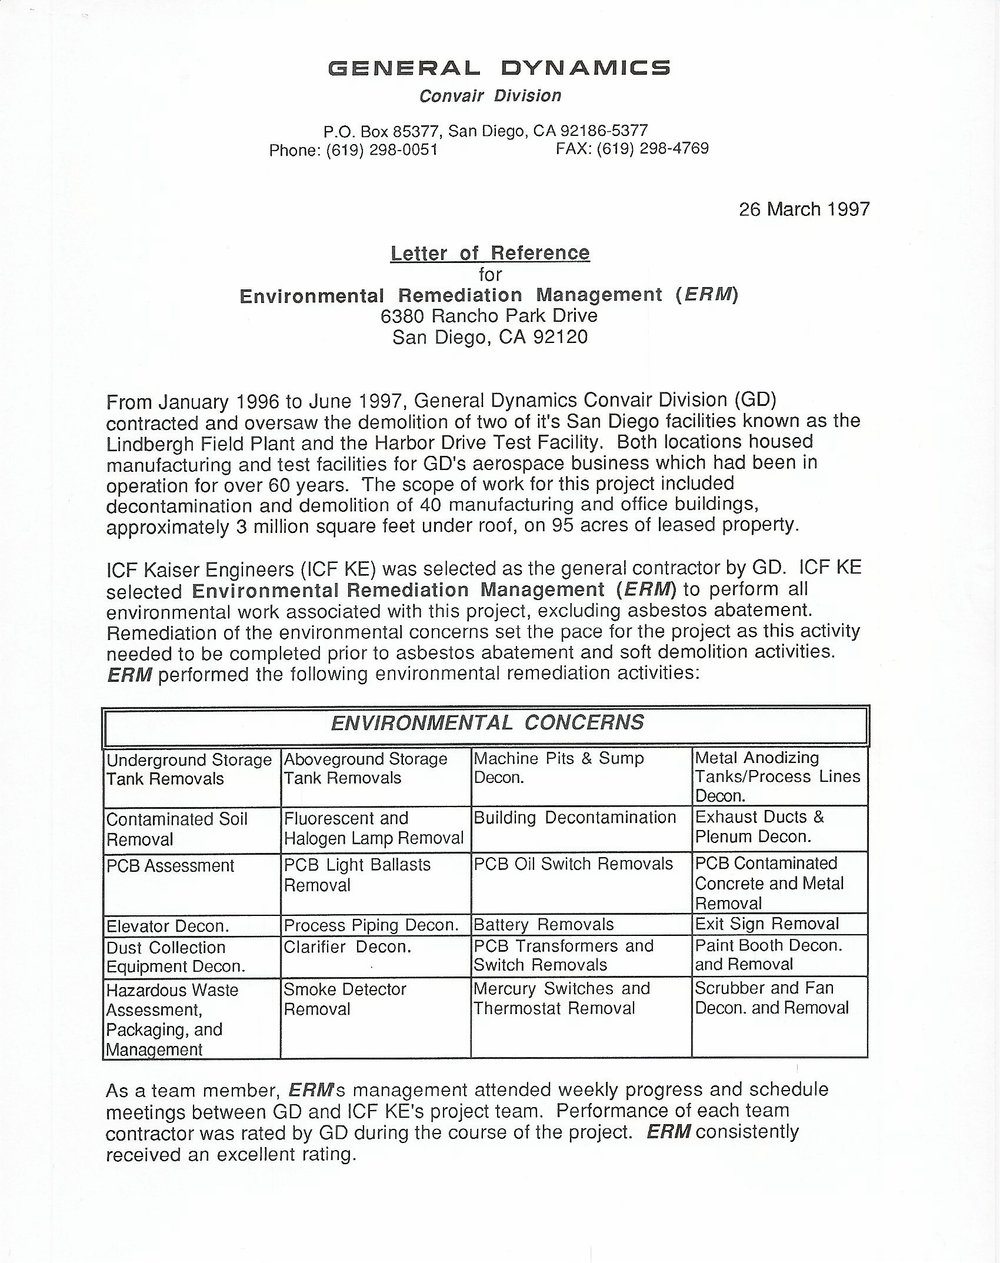 Reference Letter GD 001.jpg